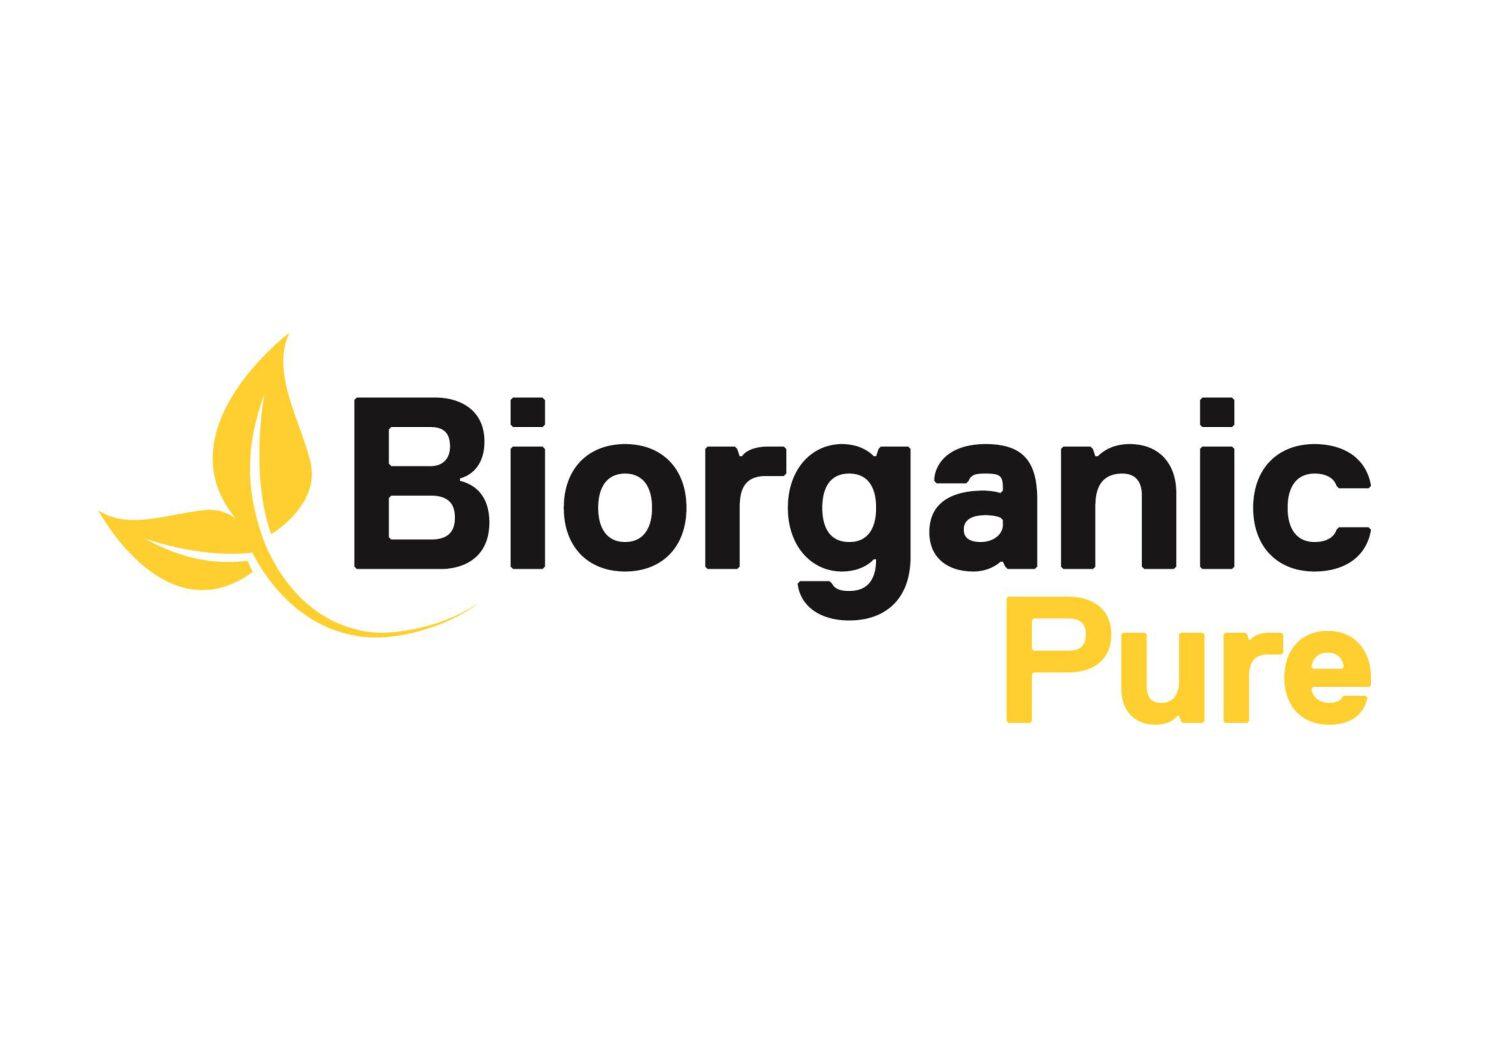 Biorganic Pure